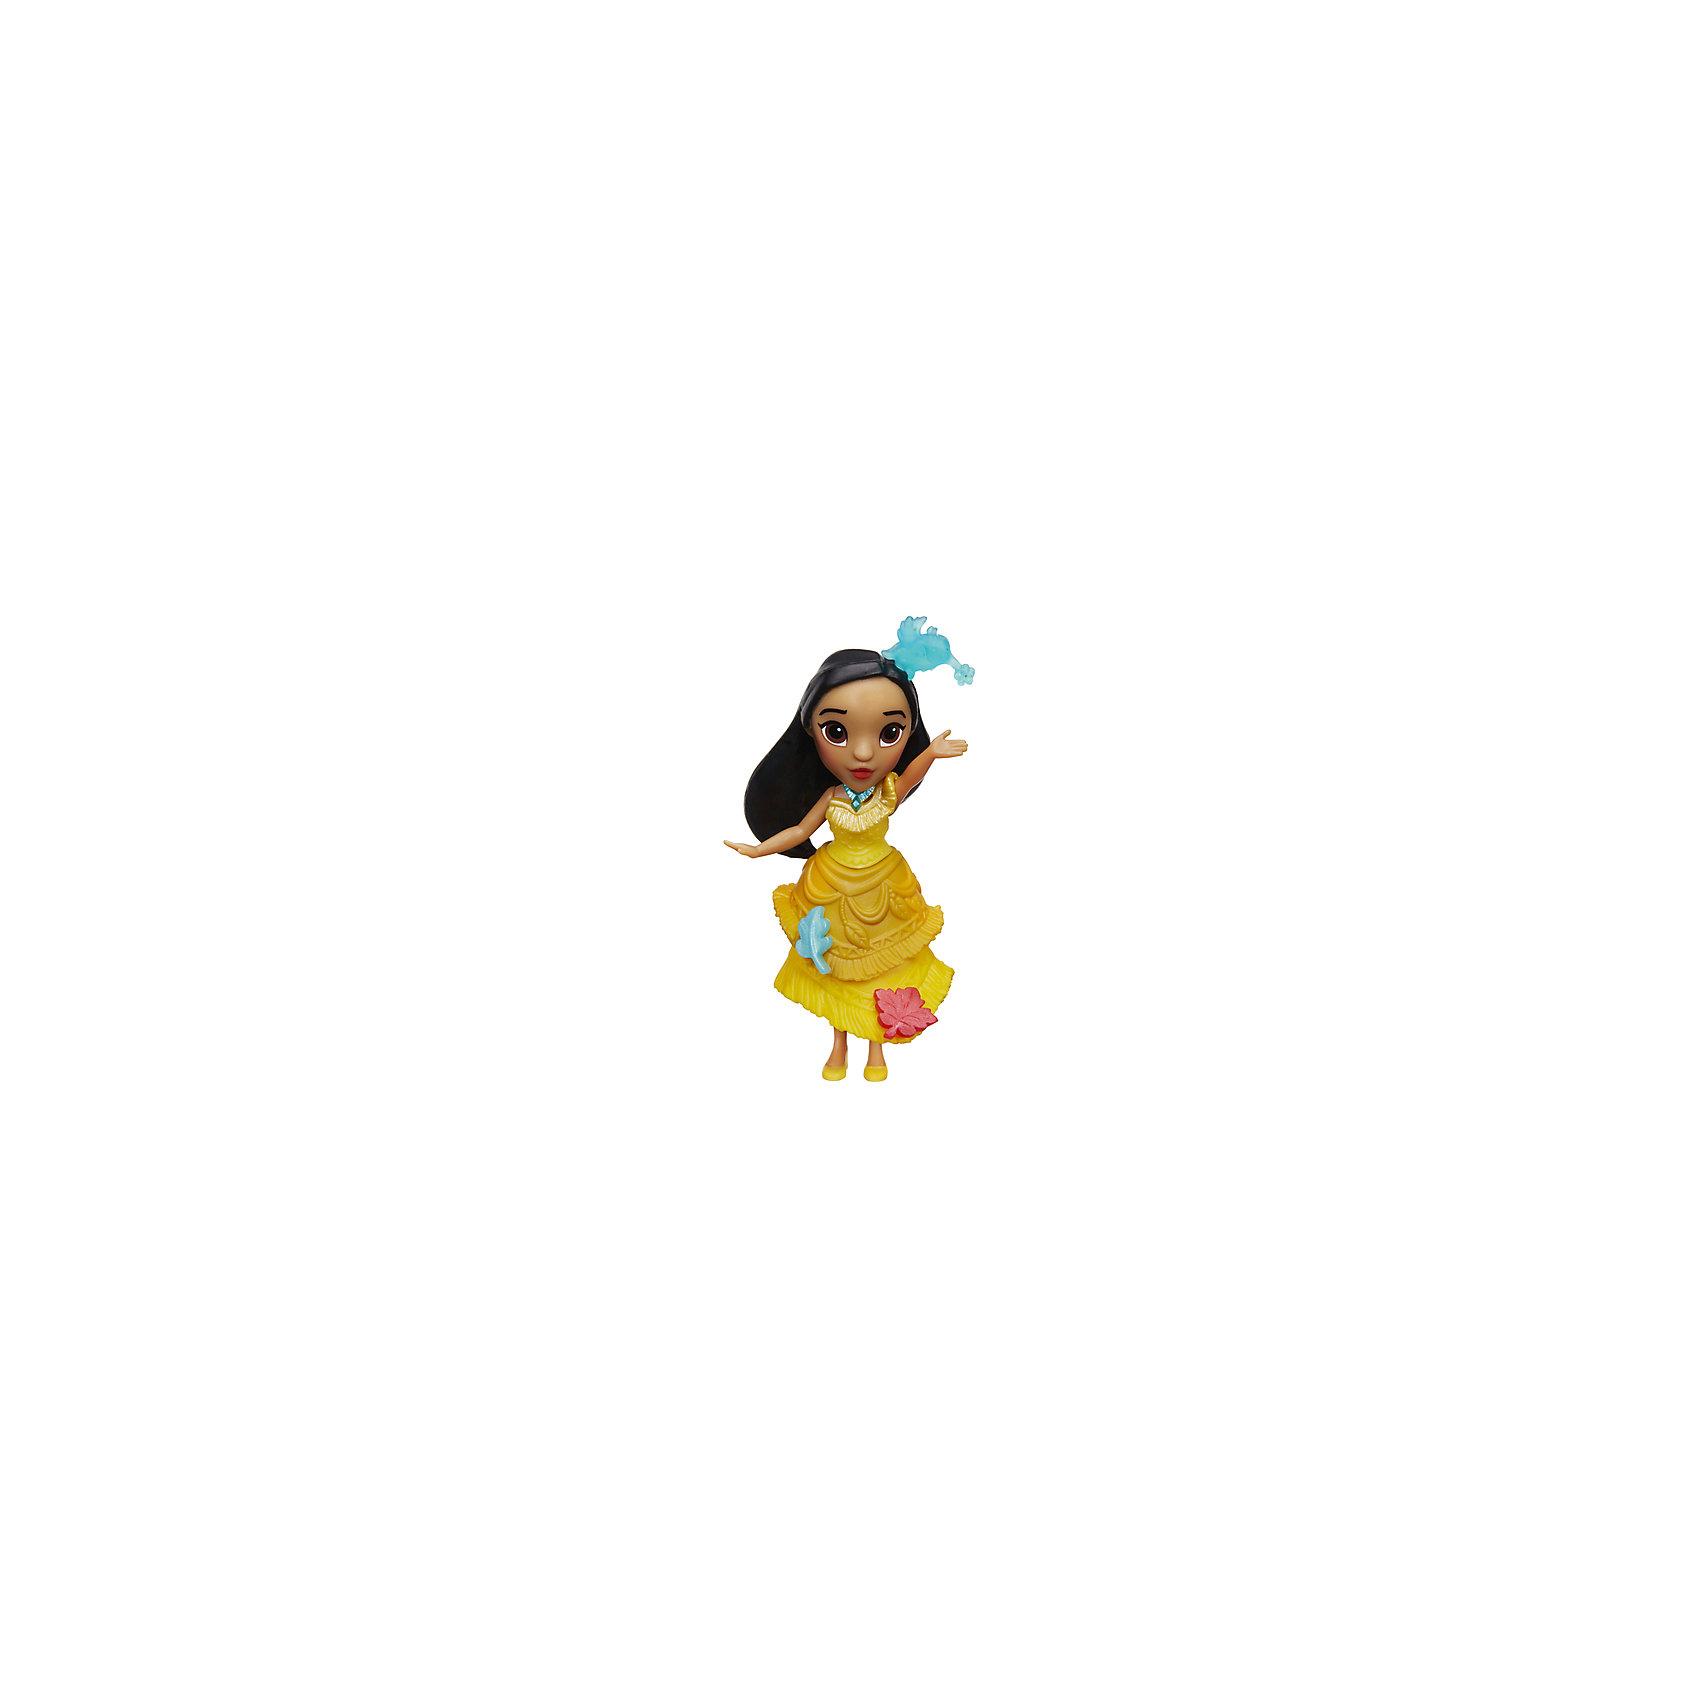 Мини-кукла Hasbro Disney Princess, ПокахонтасМини-куклы<br><br><br>Ширина мм: 176<br>Глубина мм: 152<br>Высота мм: 63<br>Вес г: 100<br>Возраст от месяцев: 48<br>Возраст до месяцев: 96<br>Пол: Женский<br>Возраст: Детский<br>SKU: 7120189